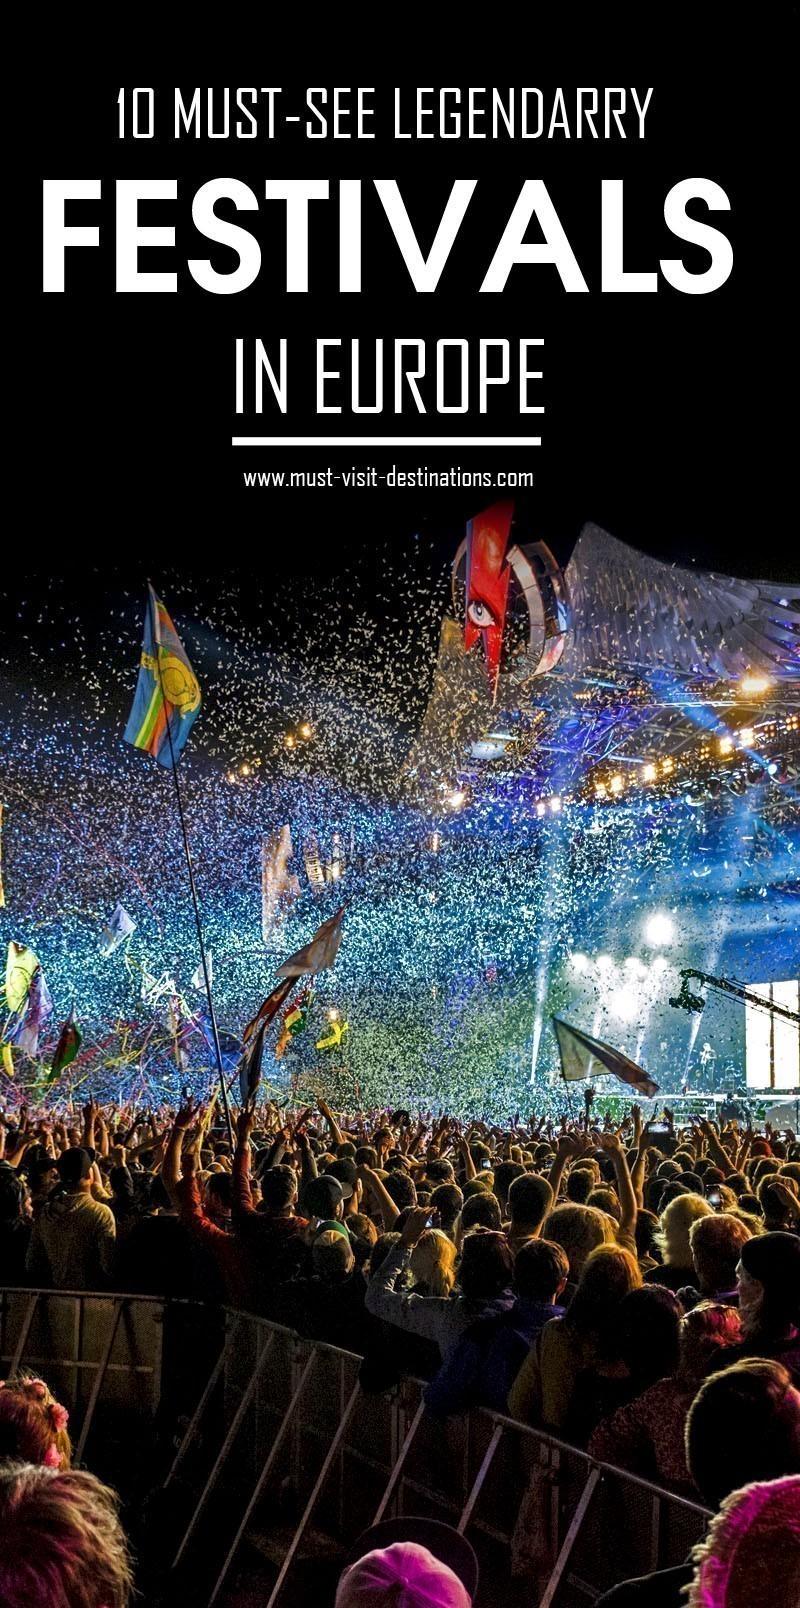 10 Must-See Legendary Festivals in Europe #travel #europe